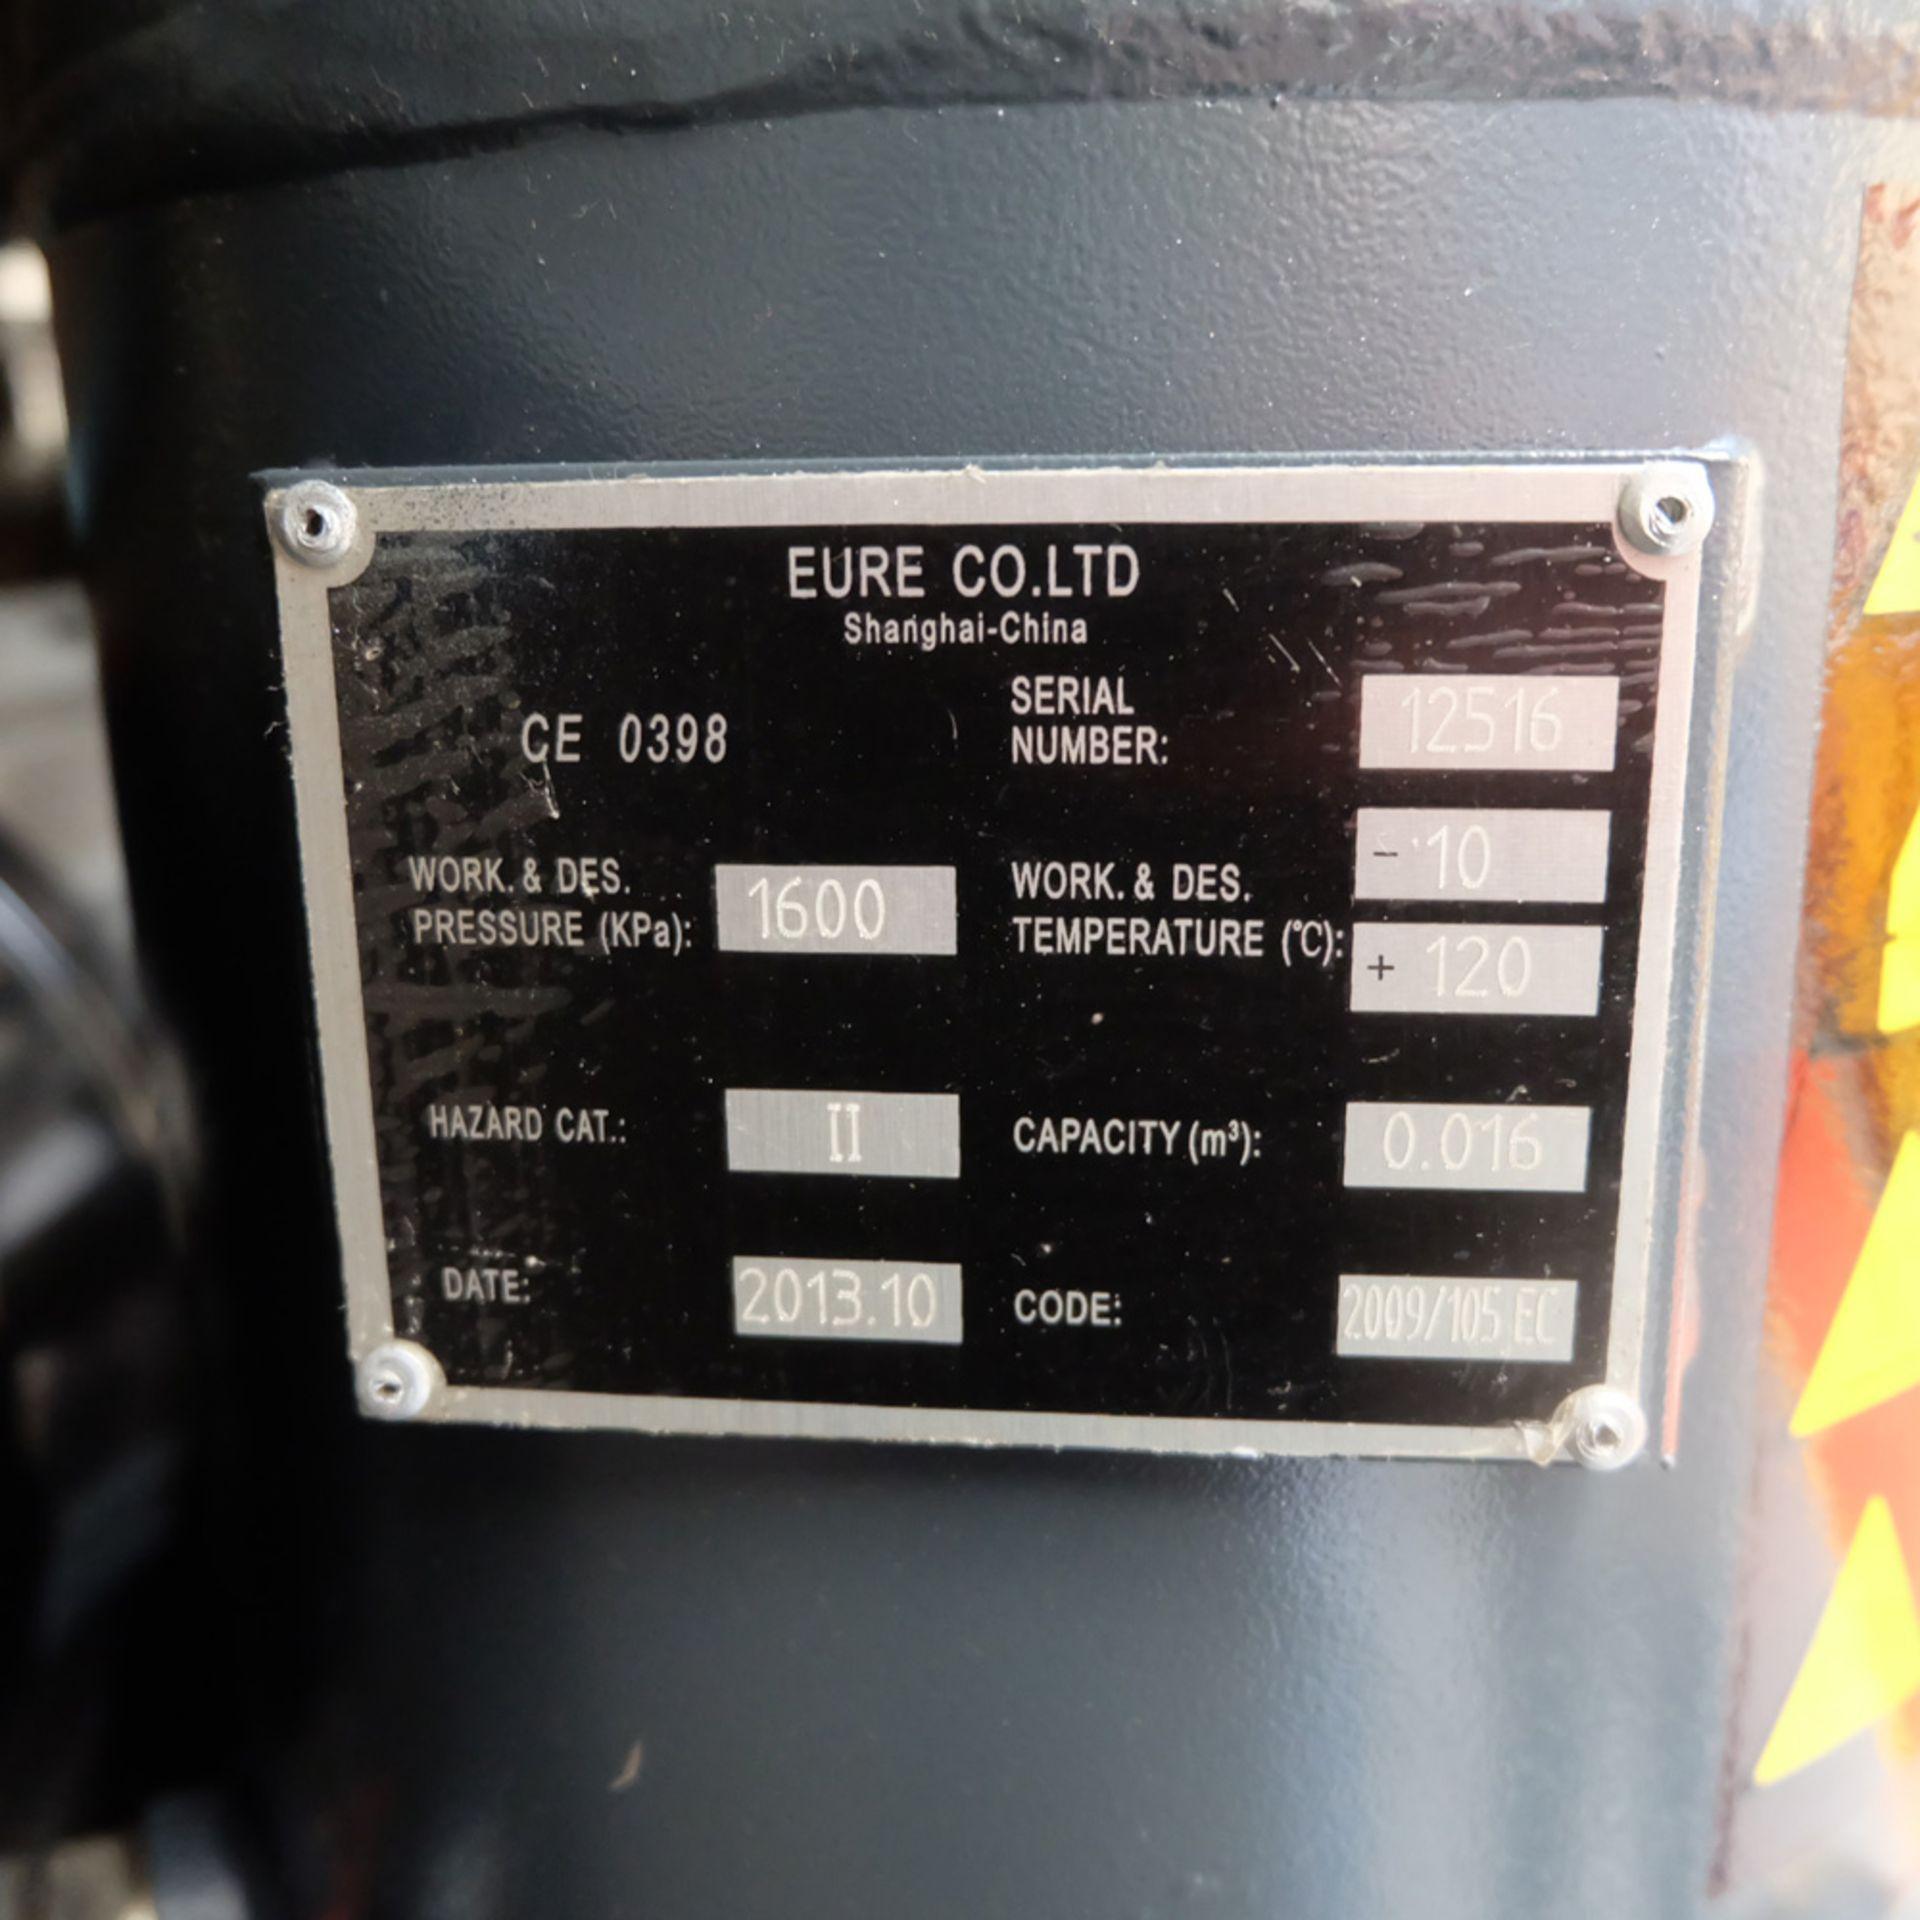 FINI VISION 25 Rotary Screw Compressor. - Image 9 of 11